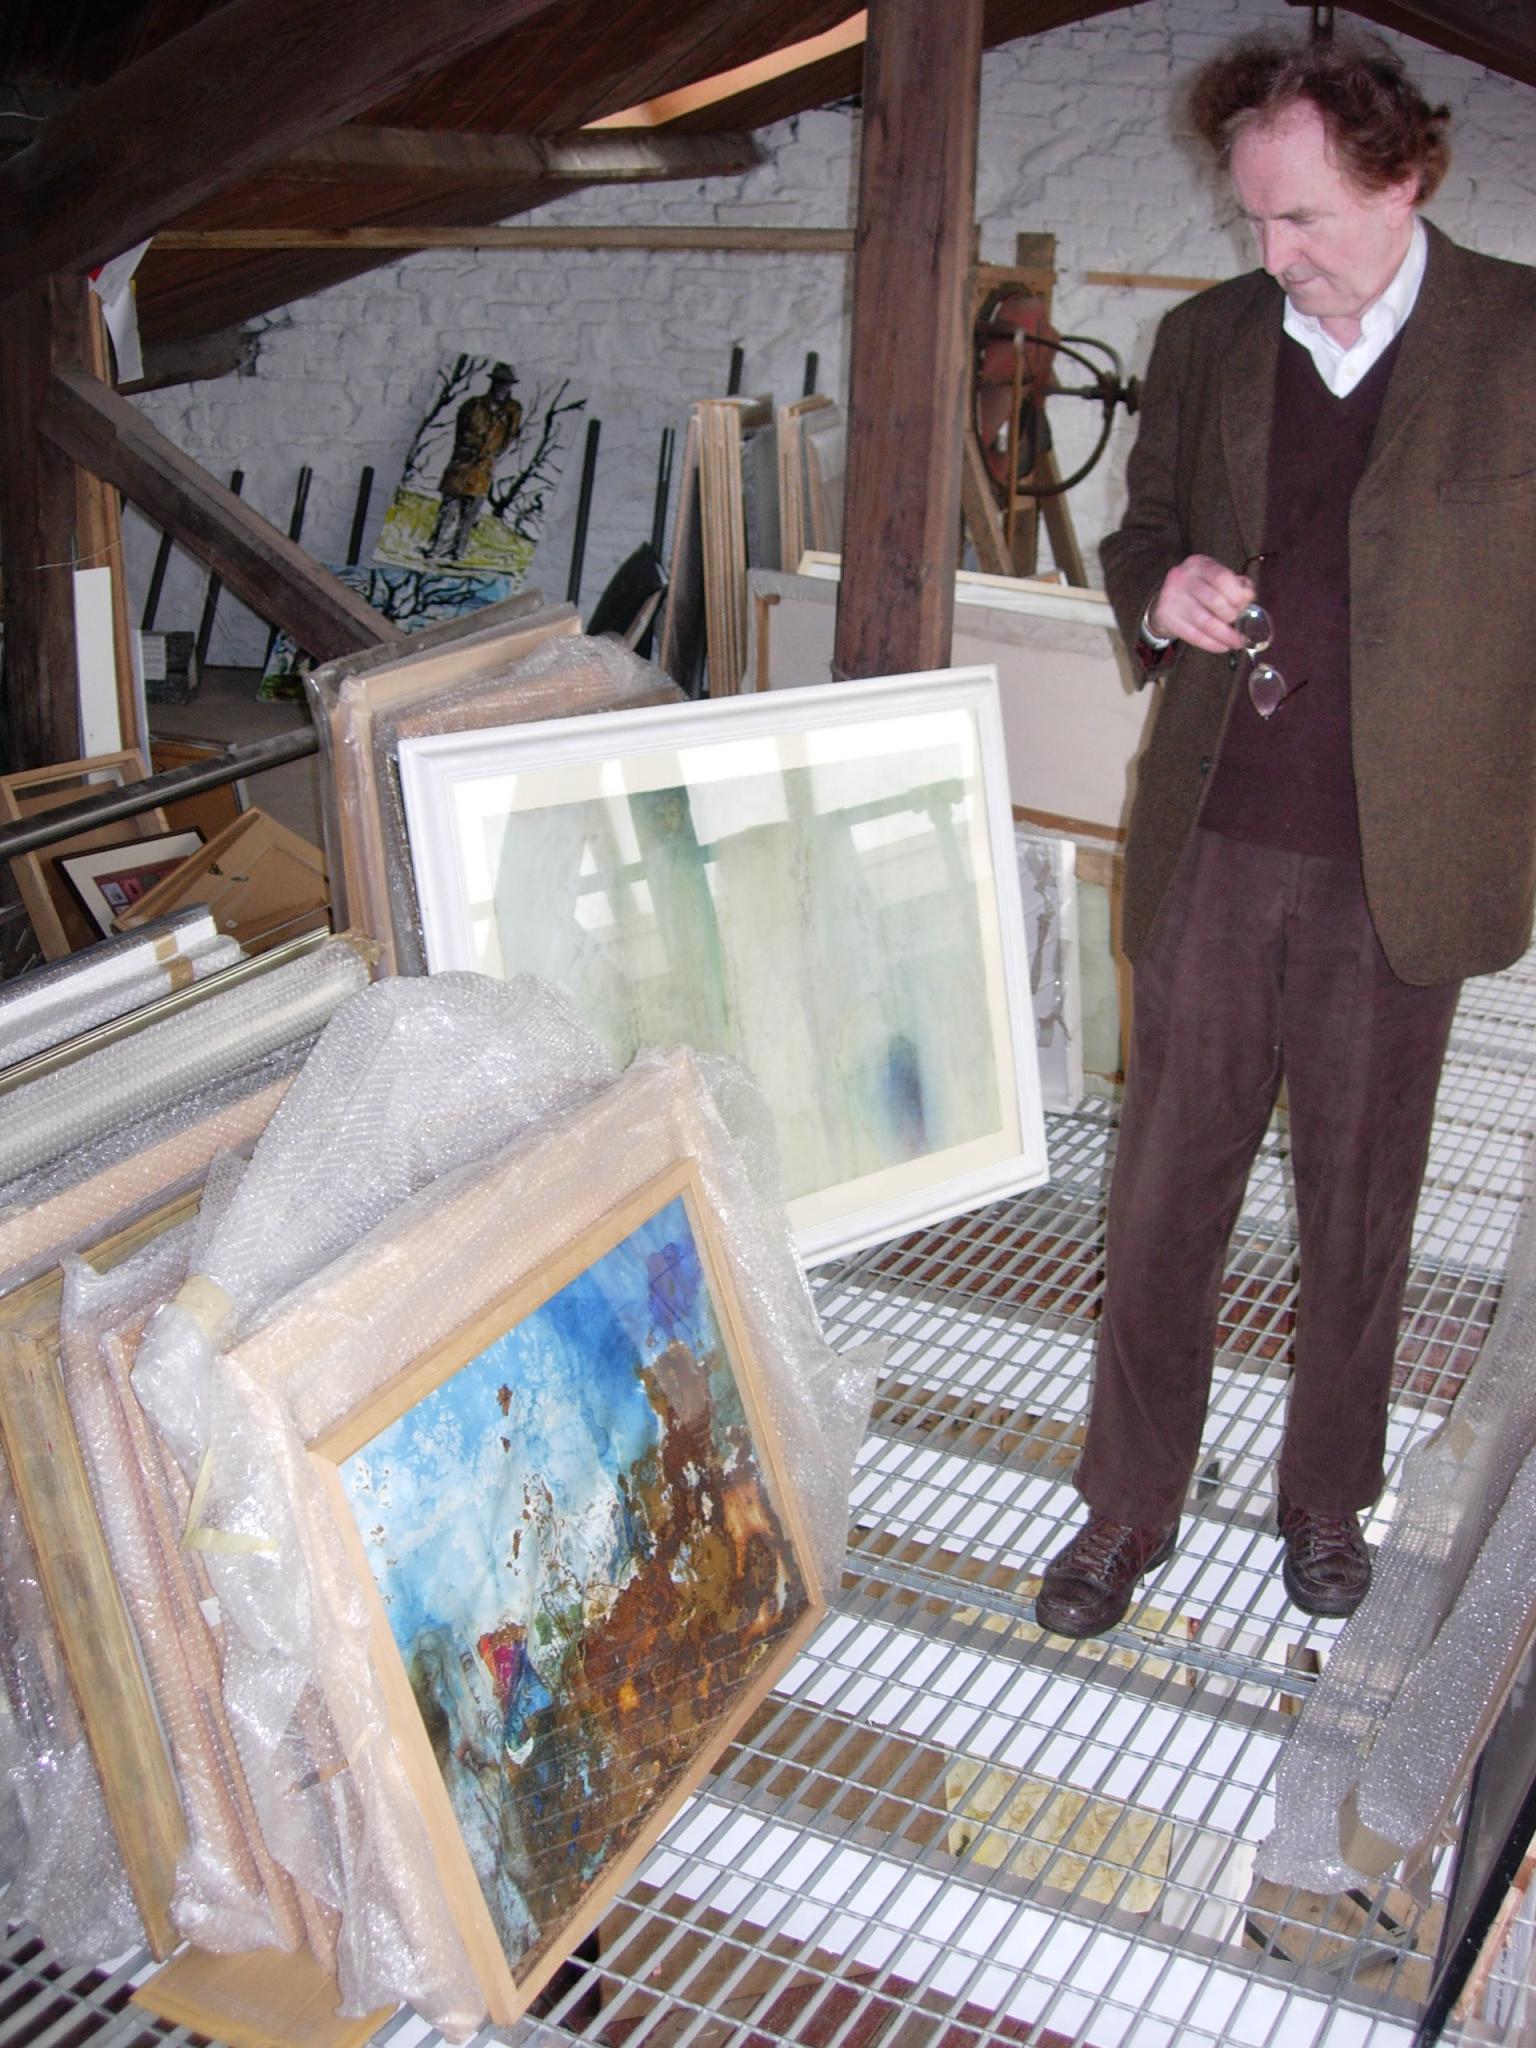 Ivor Davies in his studio, Penarth, 21 September 2009